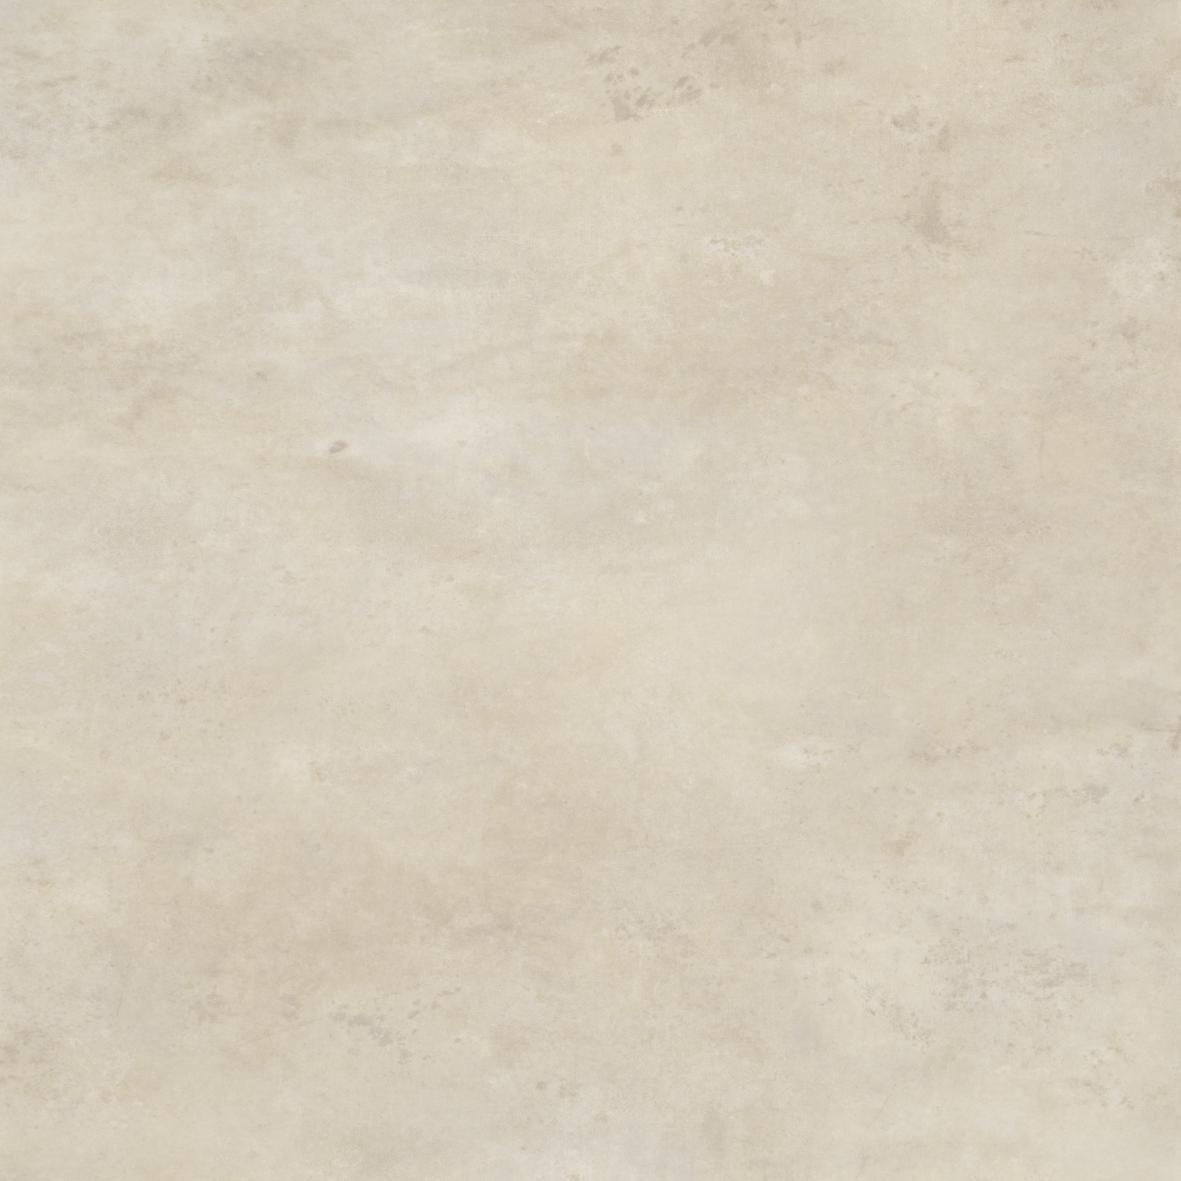 Gerflor Solidtex Novara Beige 1827 - 400 cm